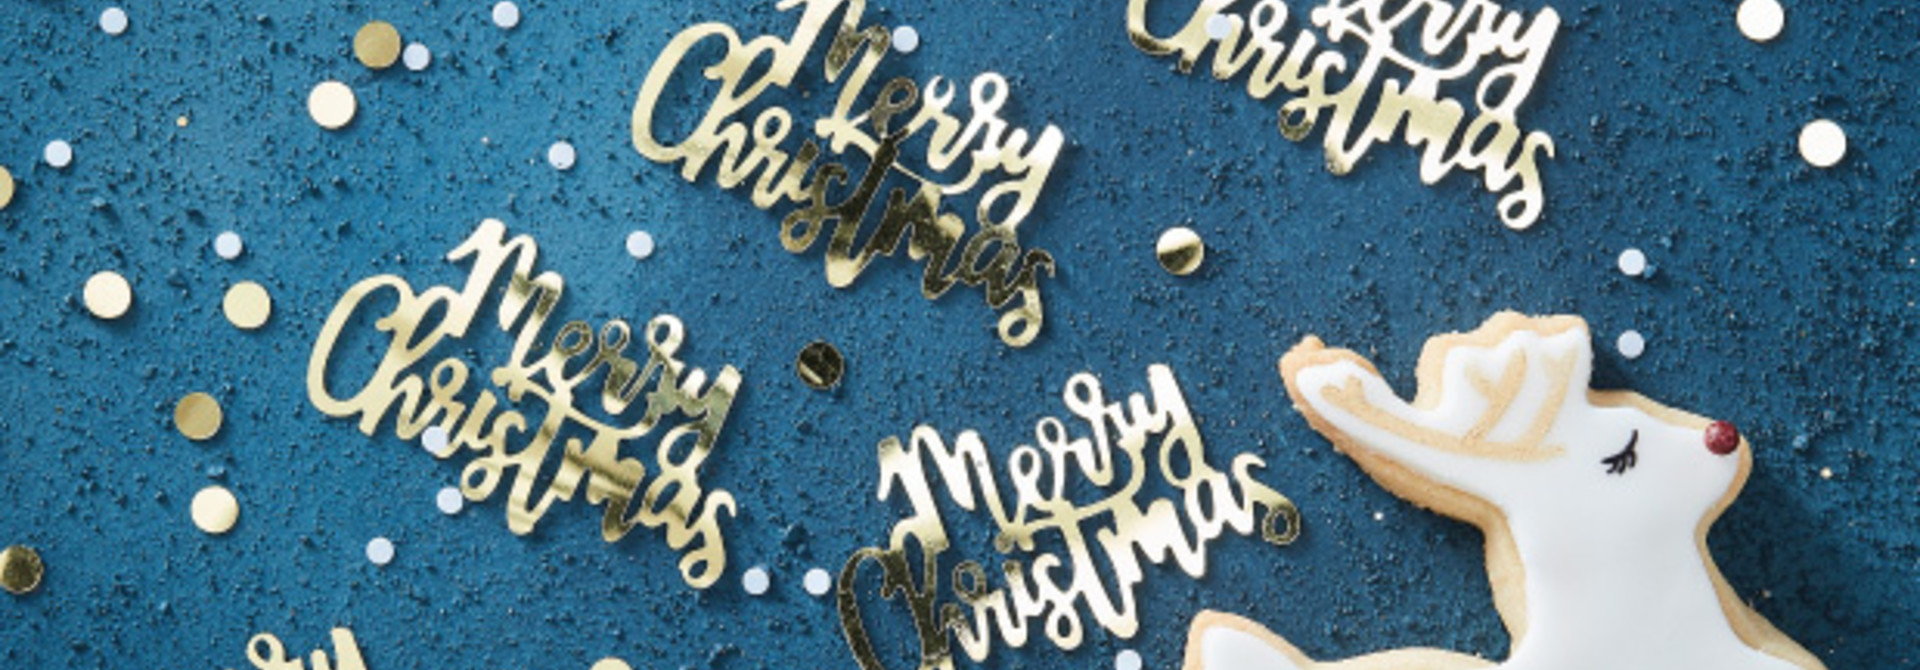 Confetti Merry Christmas Gold Christmas